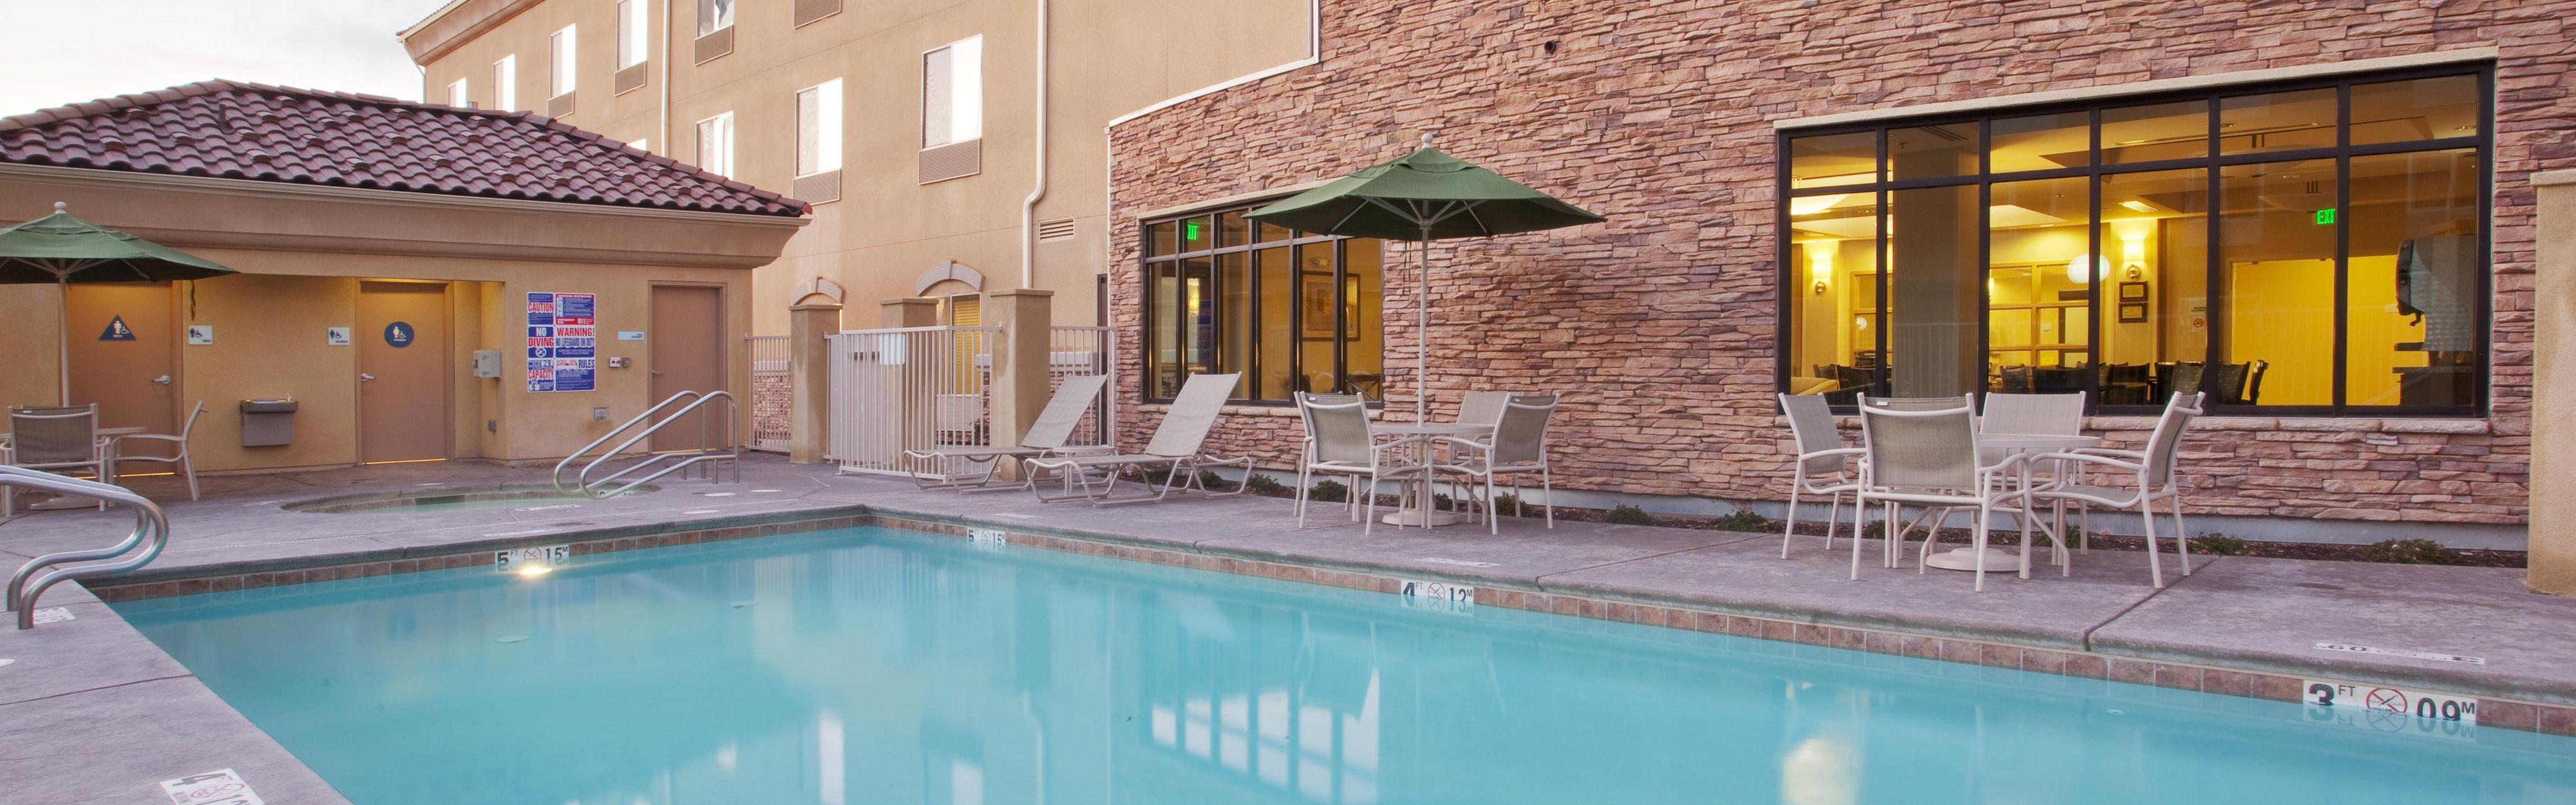 Holiday Inn Express & Suites Merced - Yosemite Natl Pk Area image 2